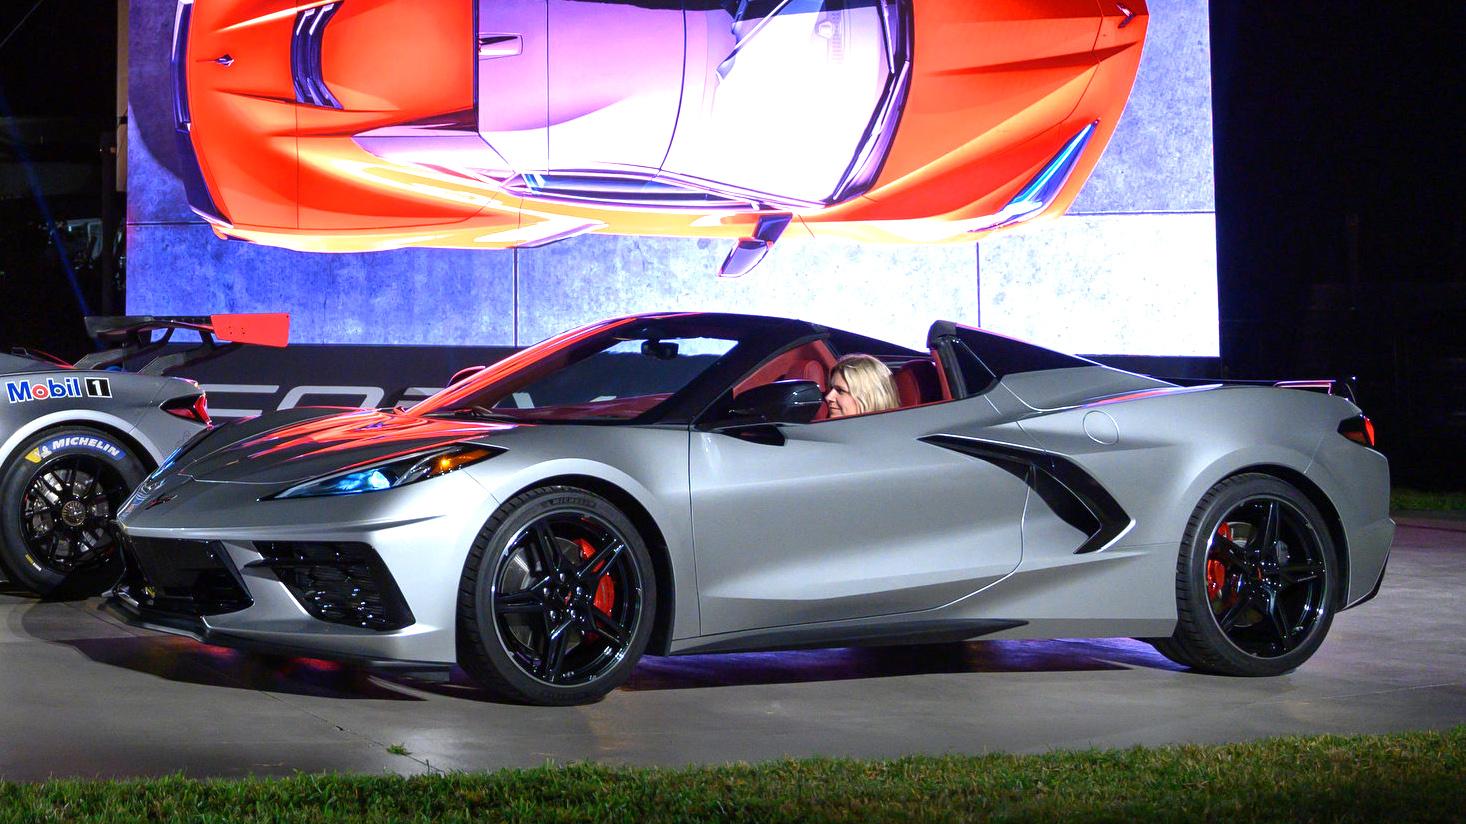 2020 Chevy Corvette convertible stiffness, weight details ...